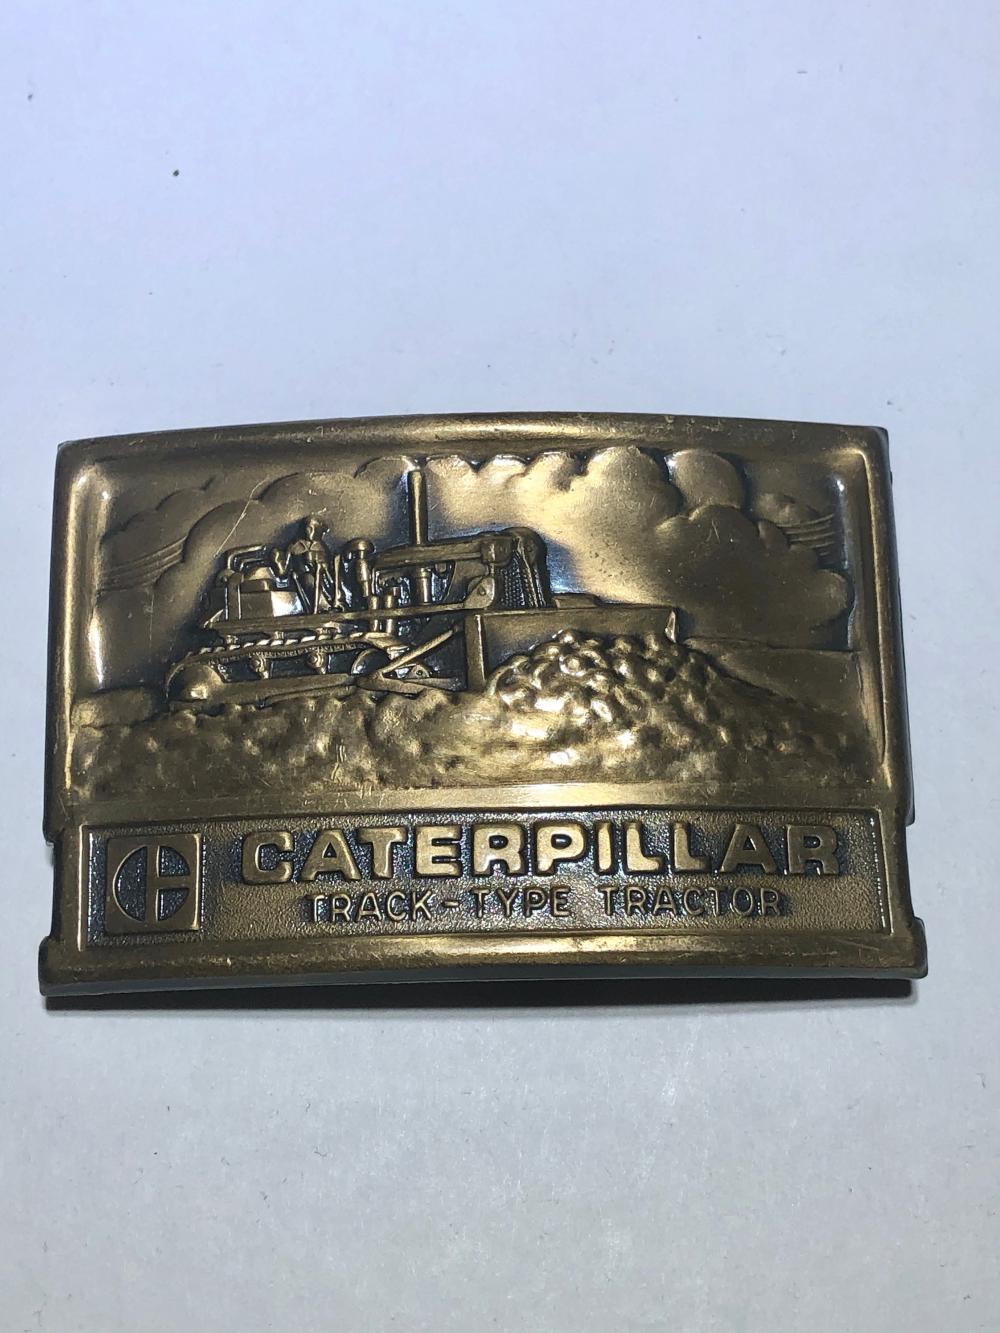 type tractor brass 3D belt buckle Leavens Mfg. Vintage Caterpillar track